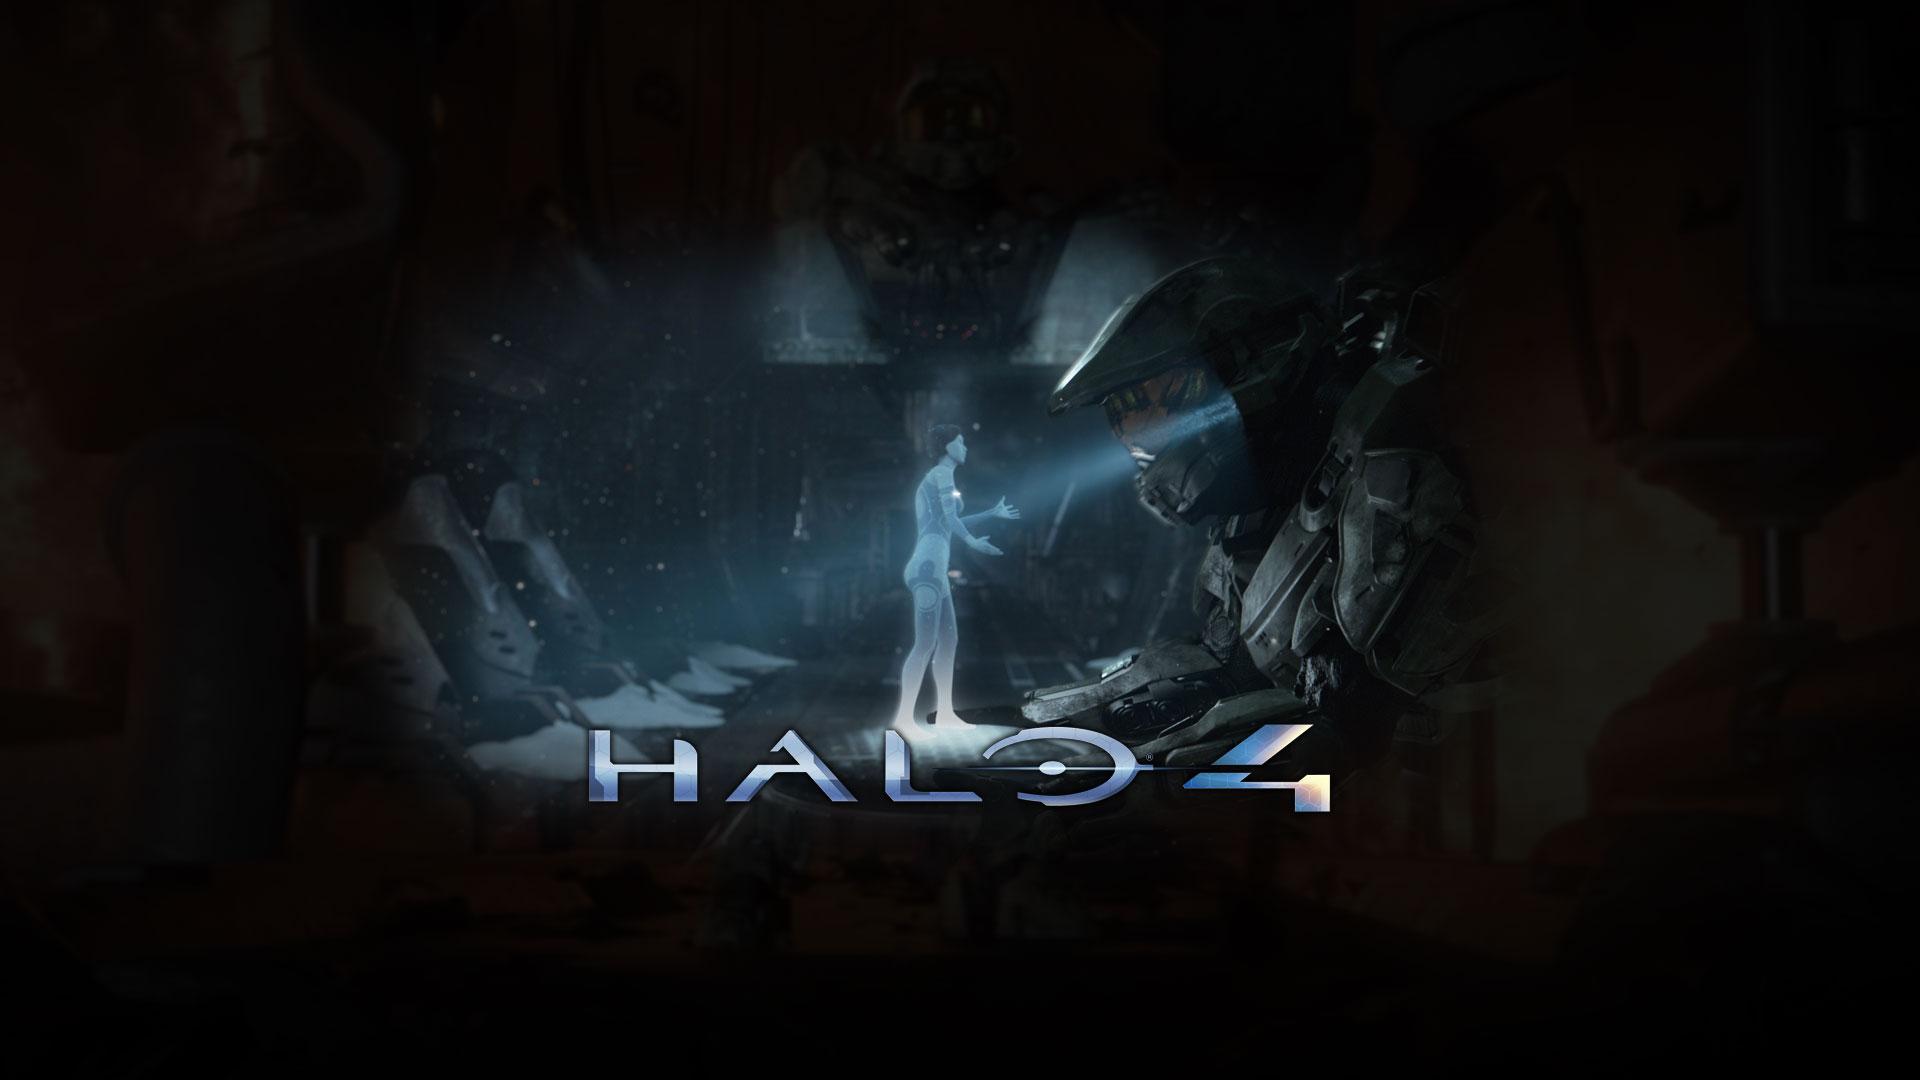 Cortana Halo 4 Wallpaper 1080P   DopePicz 1920x1080